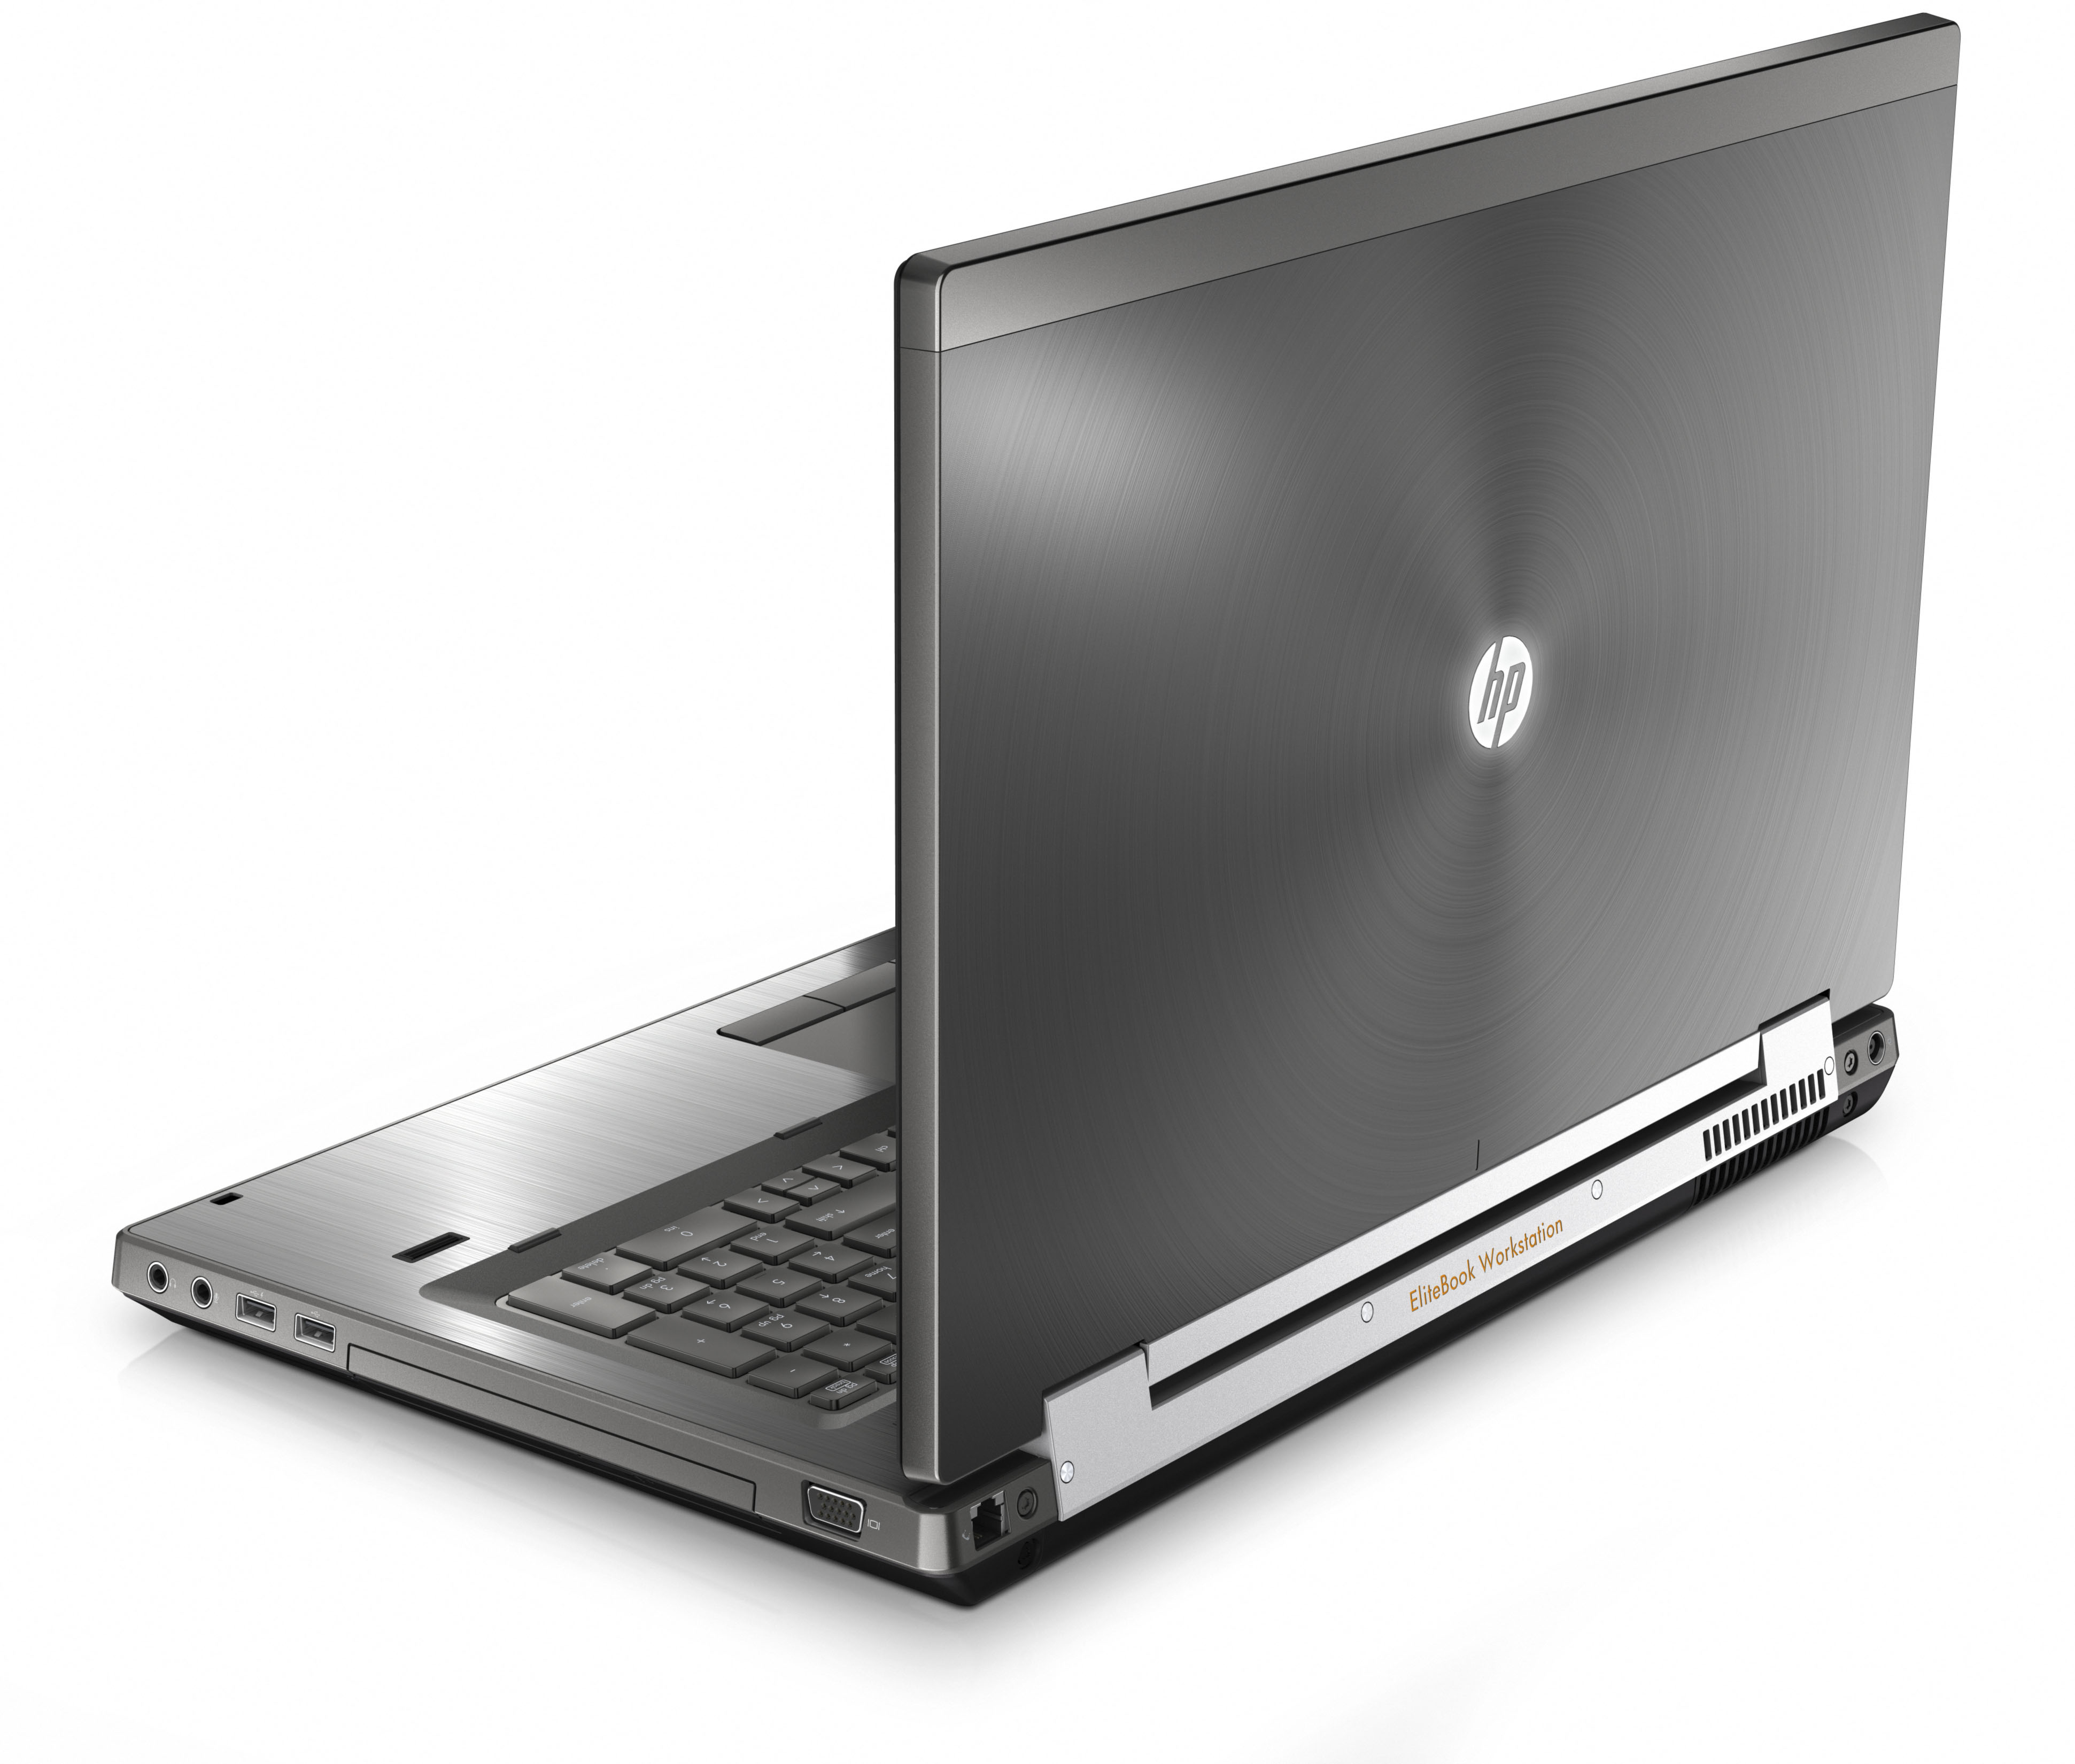 HP EliteBook 8760w Specs